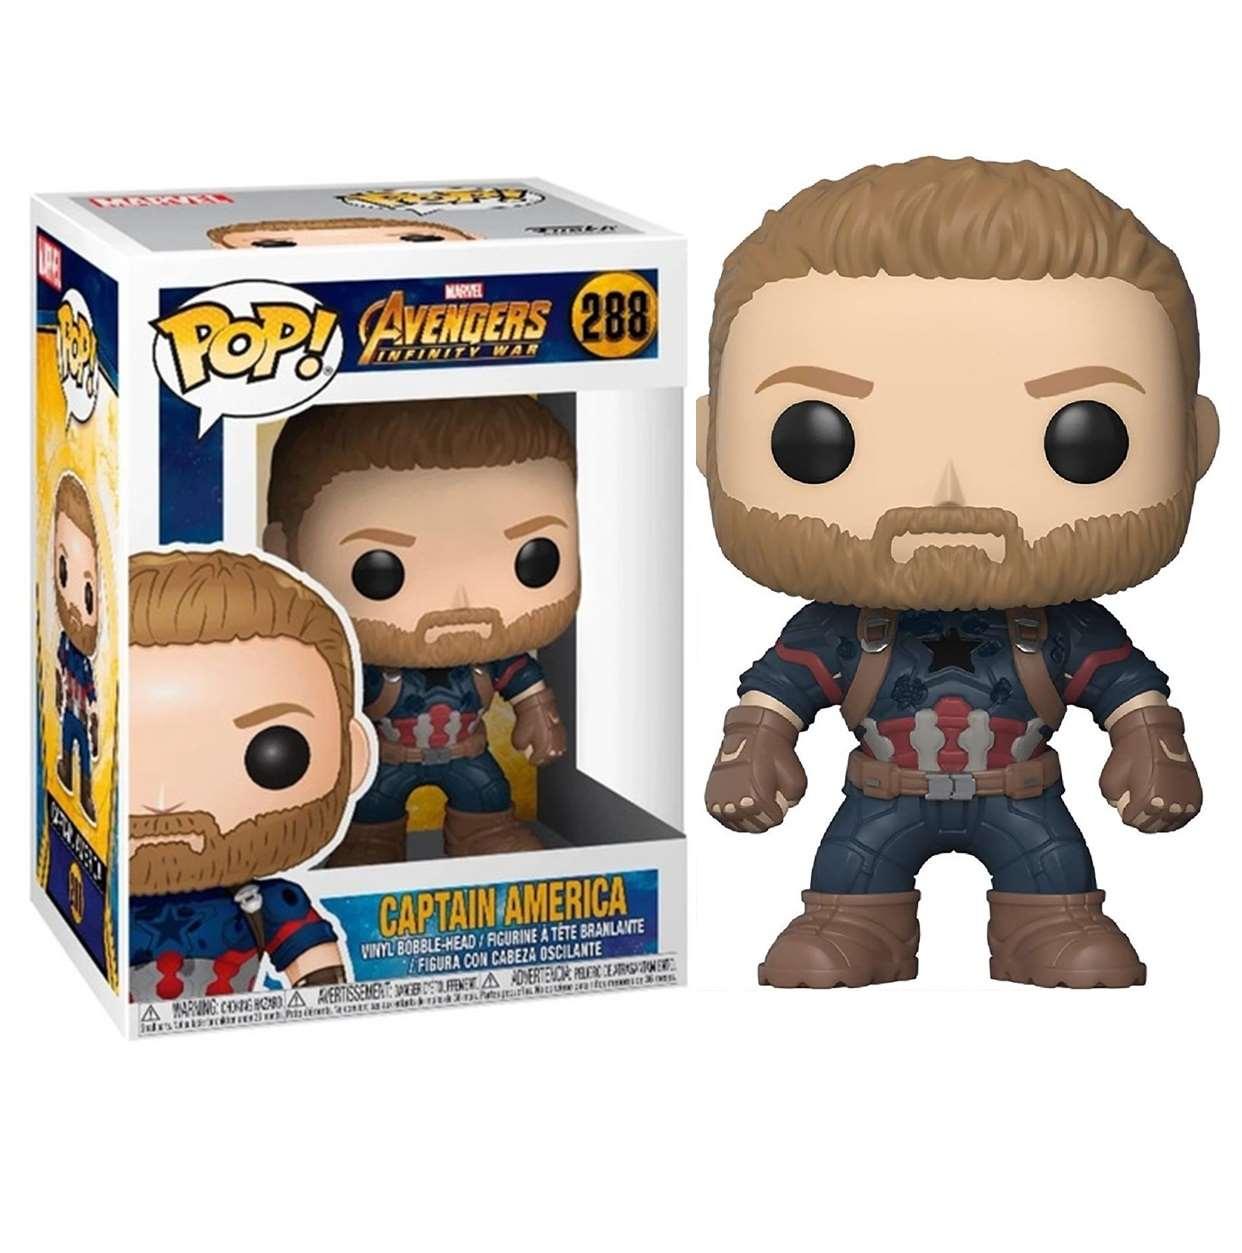 Capitán América #288 Figura Avengers Infinity War Funko Pop!